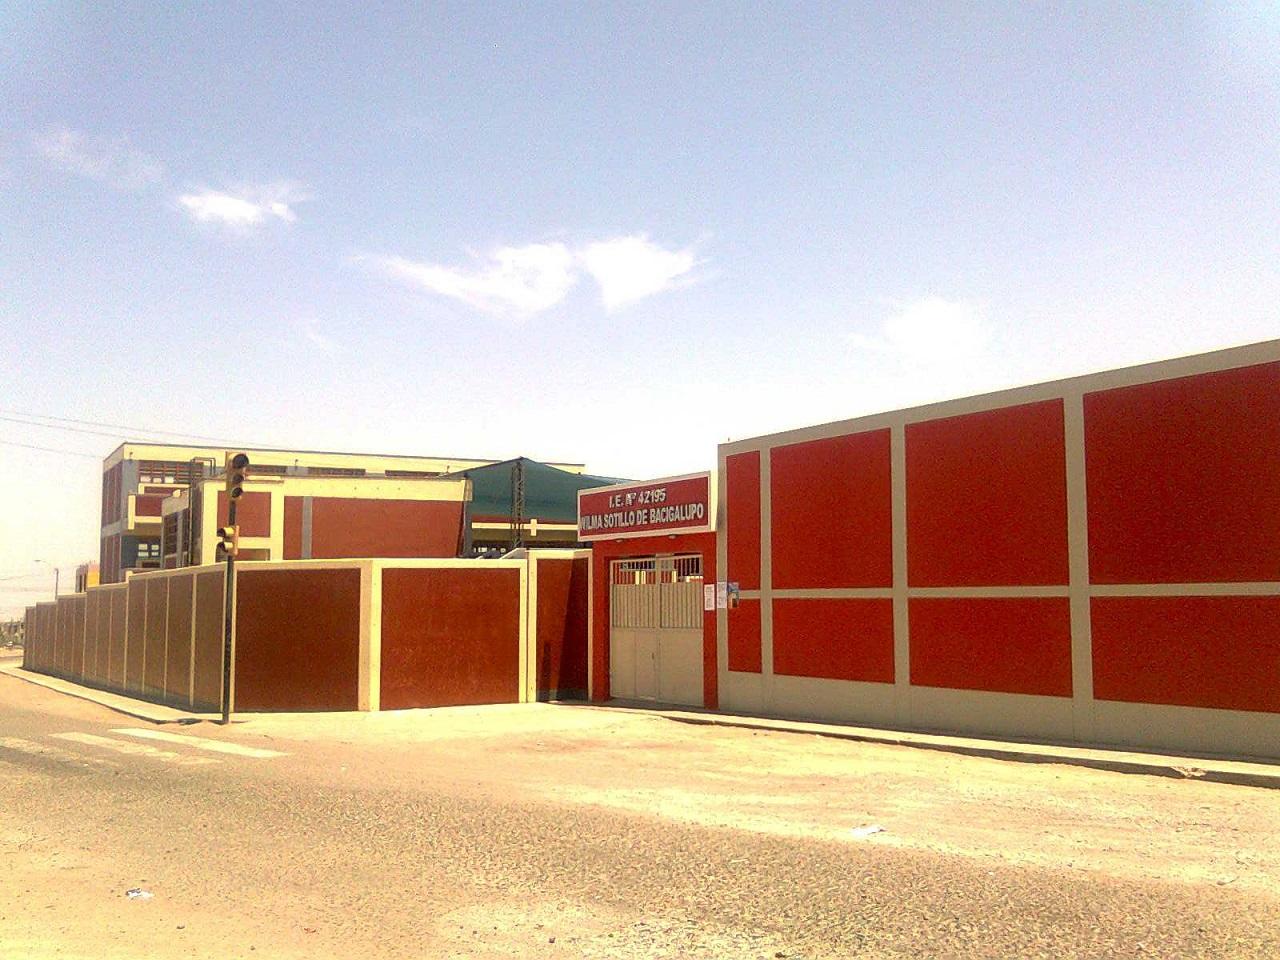 CEBA 42195 WILMA SOTILLO D. BACIGALUPO - Tacna